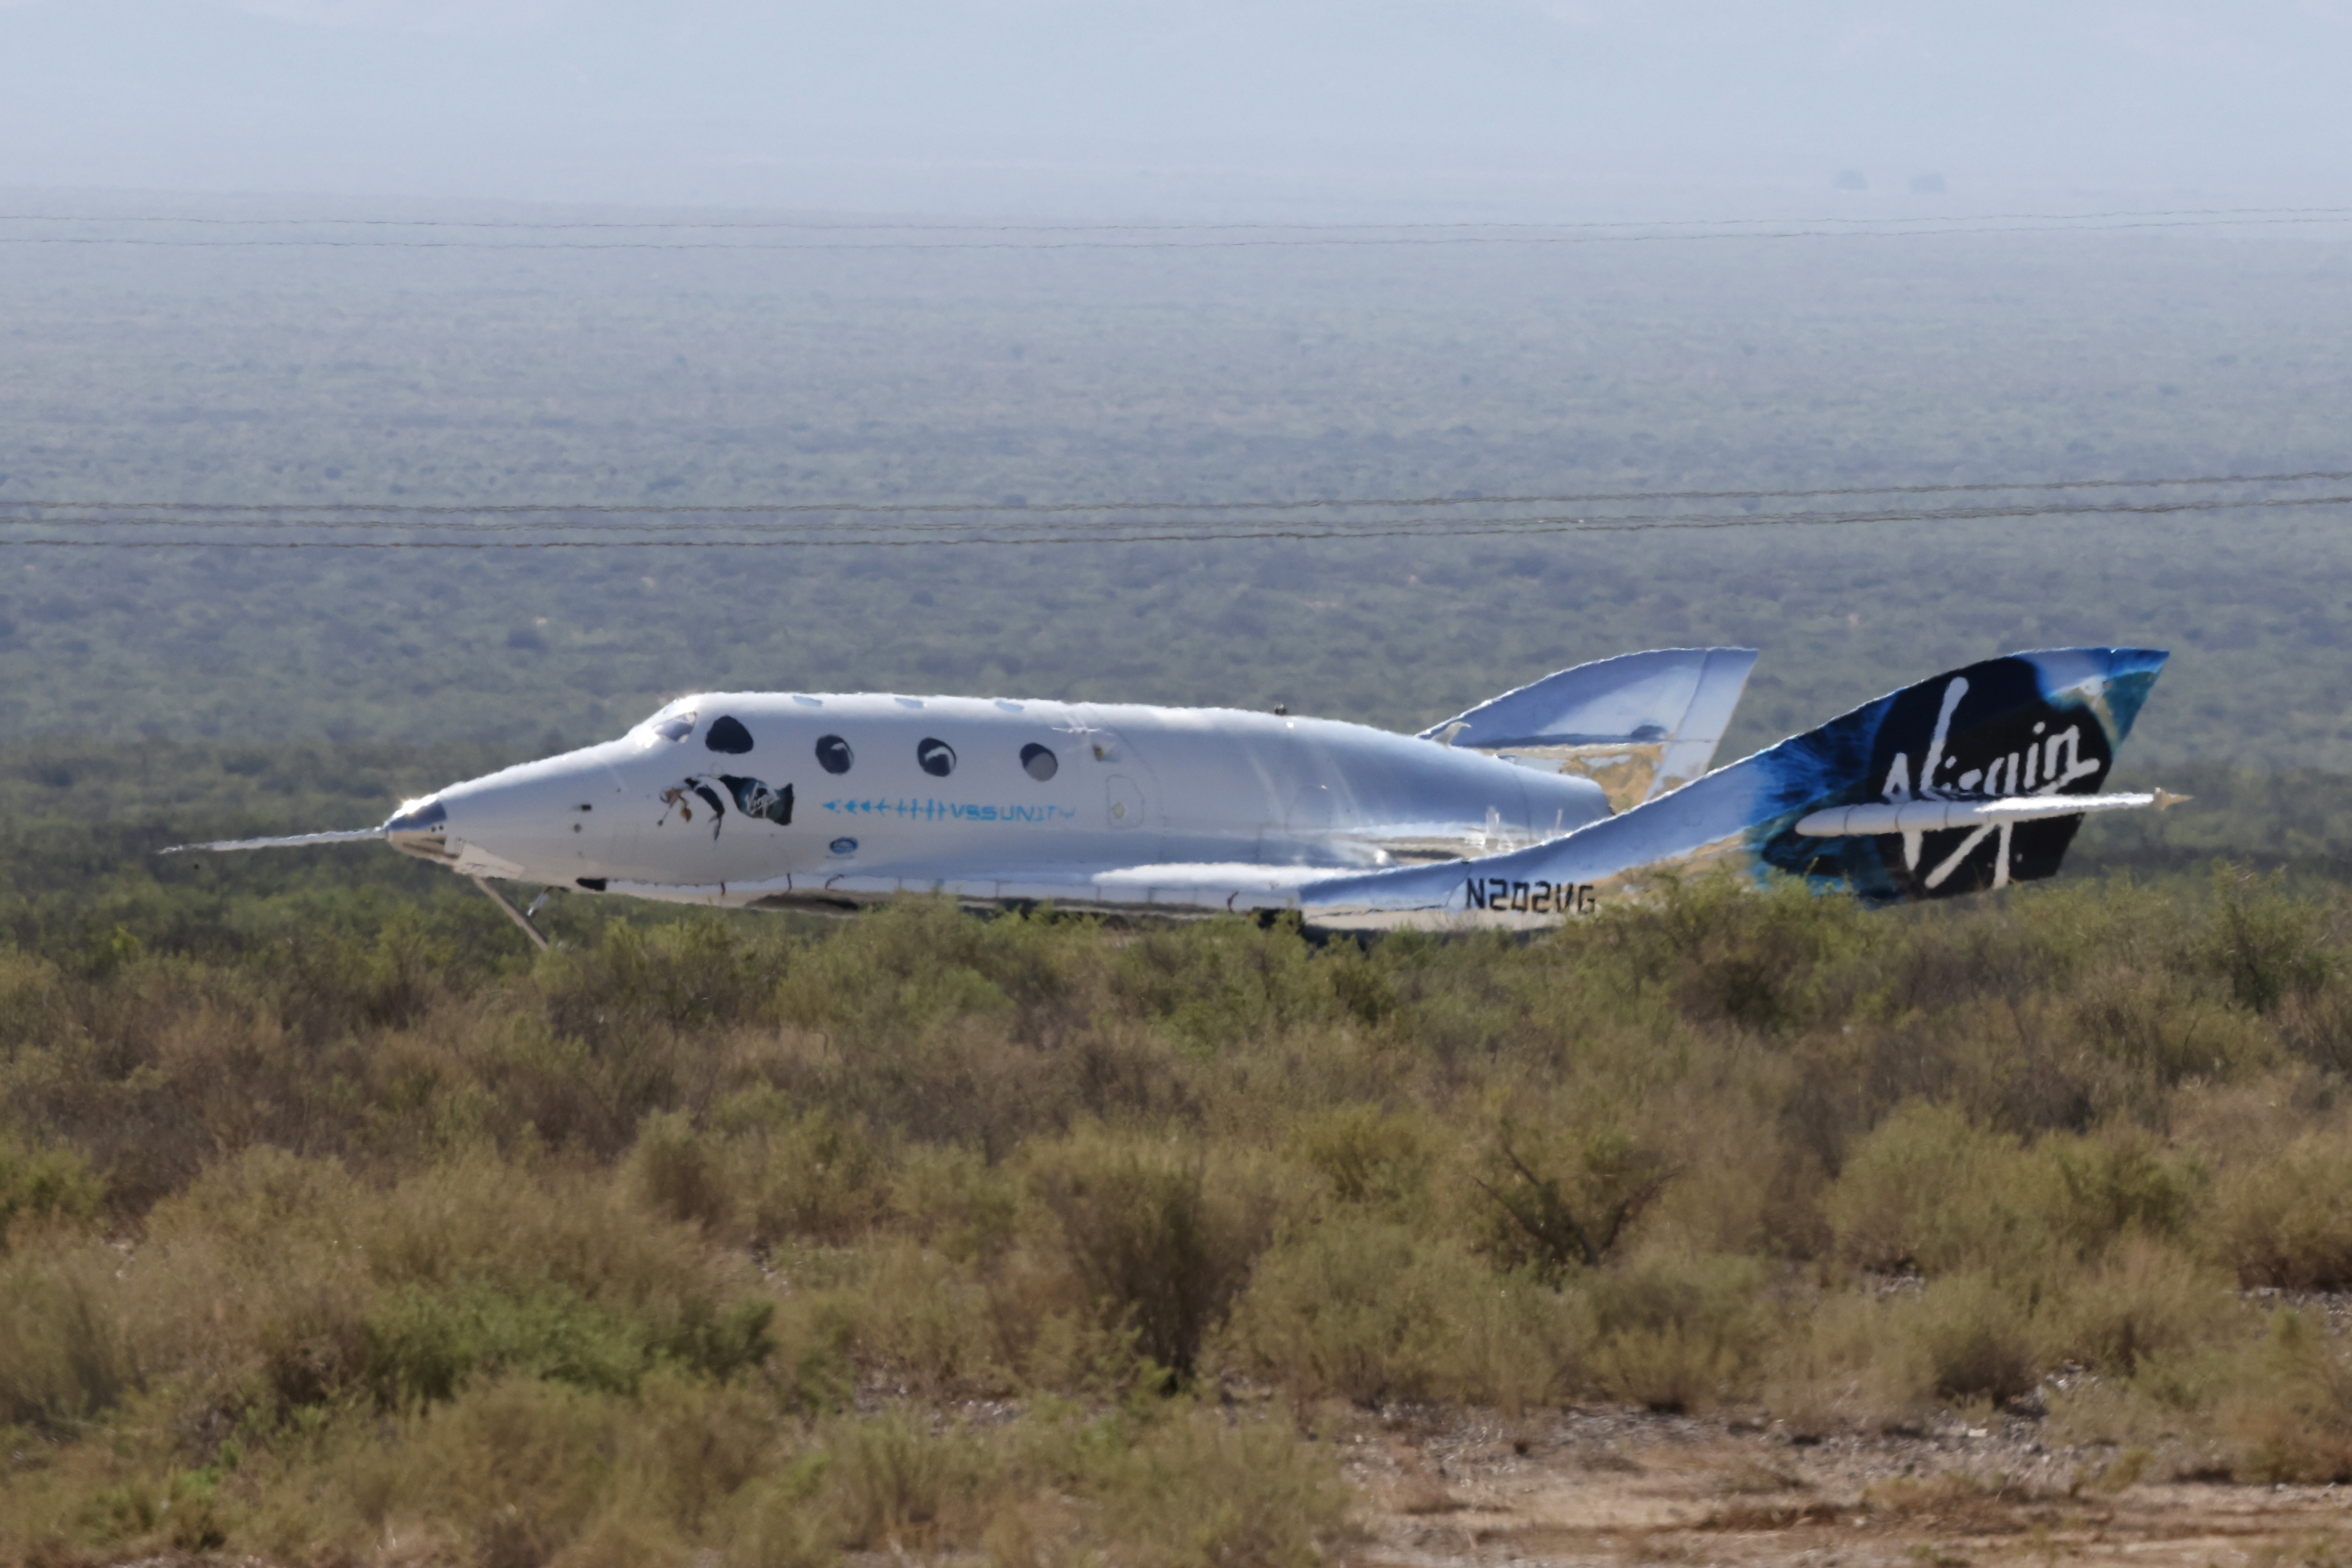 Virgin Galactic's passenger rocket plane VSS Unity, carrying billionaire entrepreneur Richard Branson and his crew.